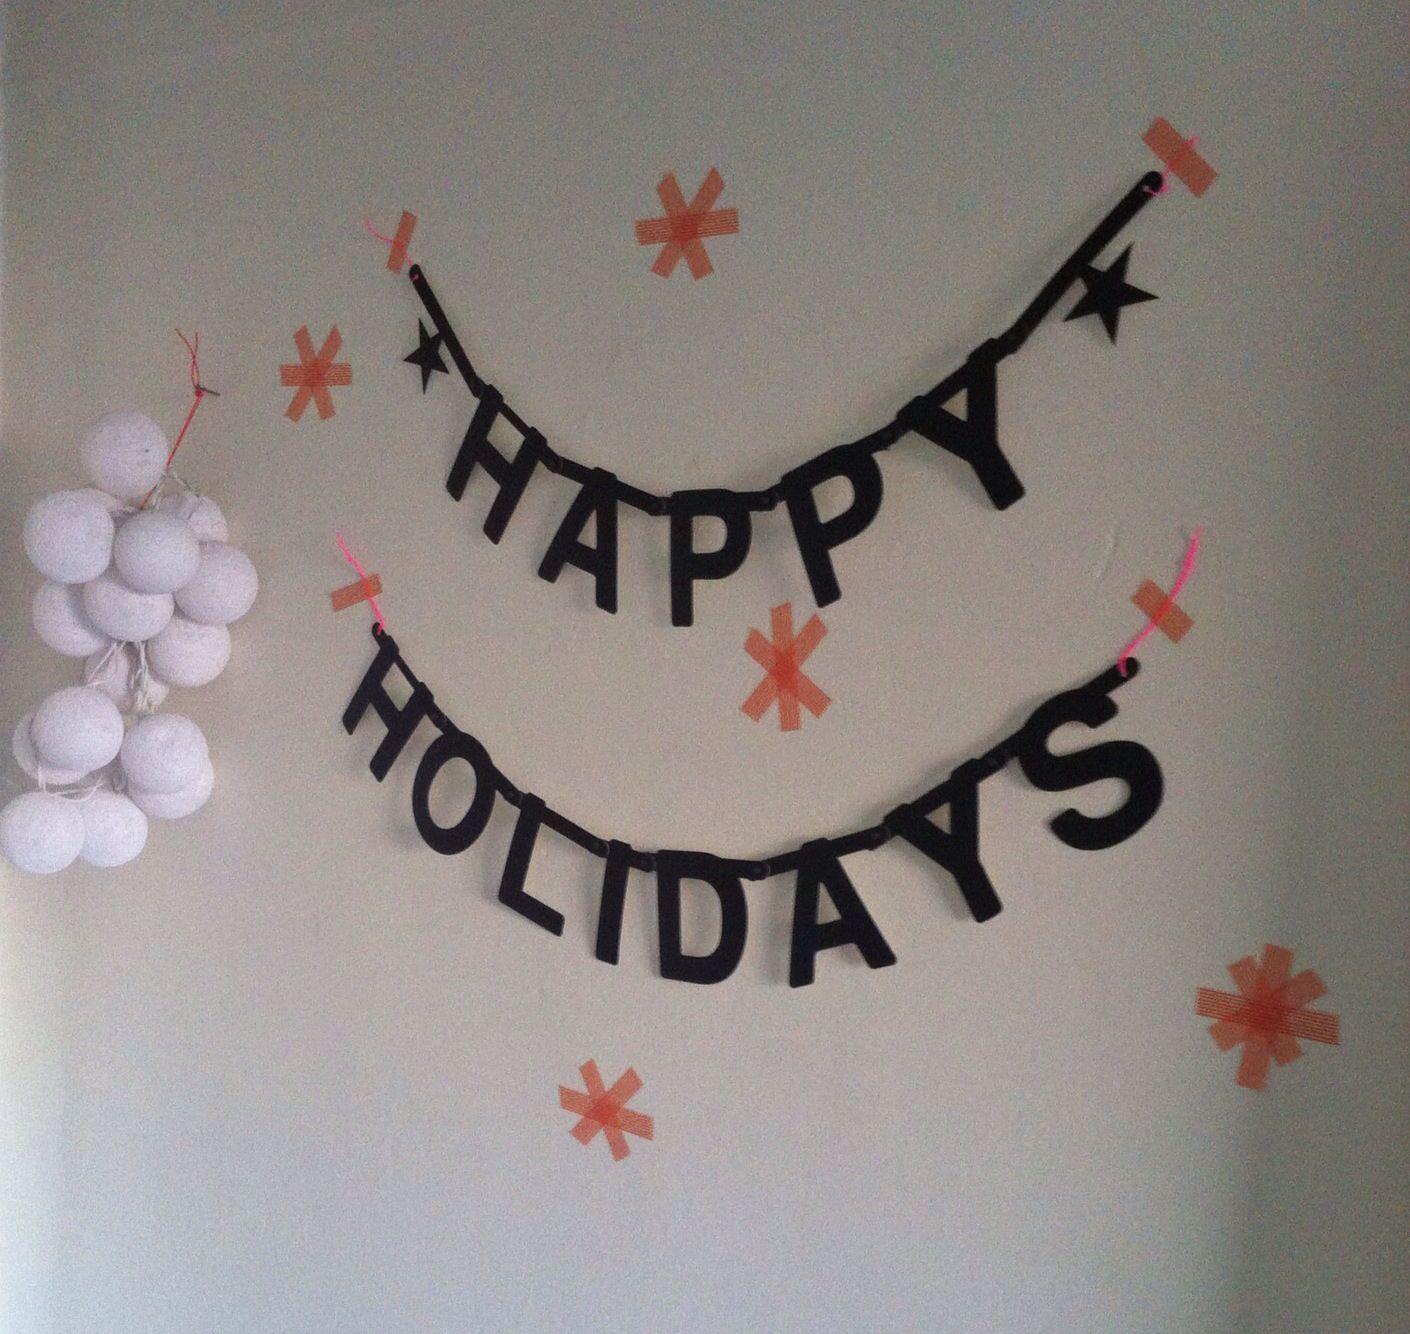 Holiday greetings!